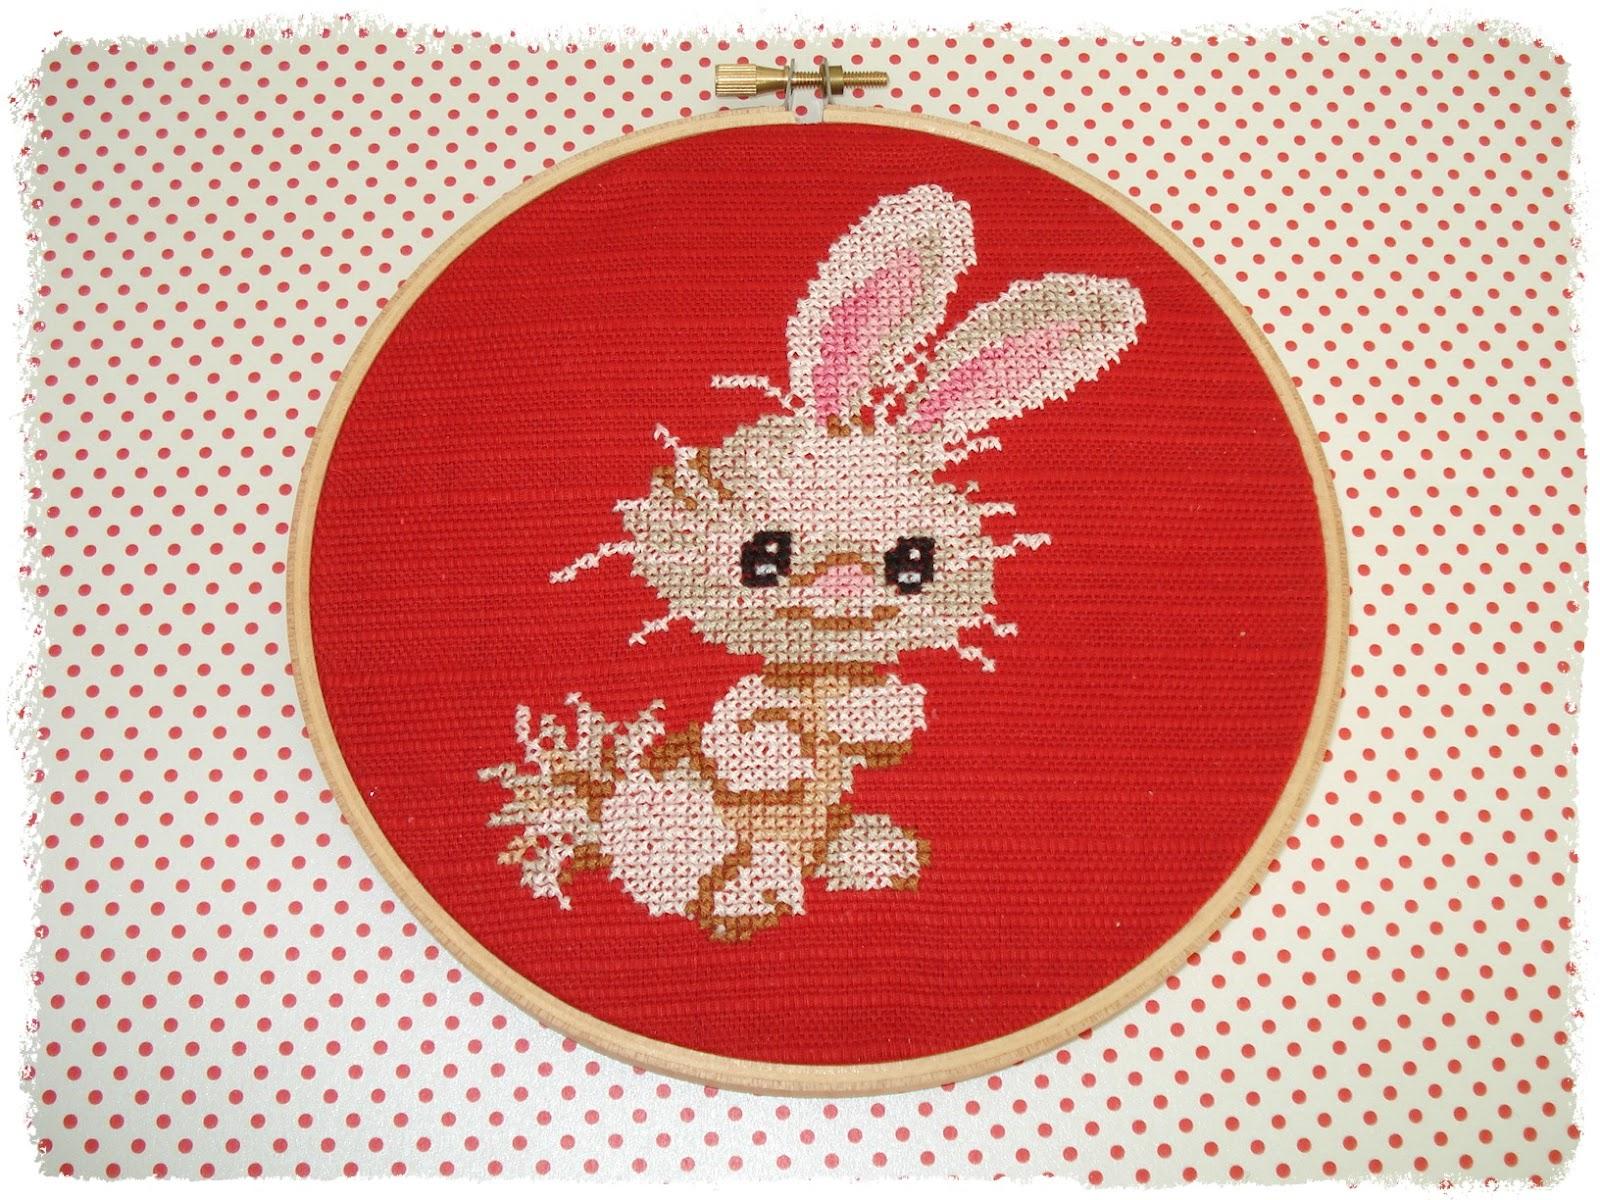 Cupcake cutie benny the bunny embroidery hoop art tutorial